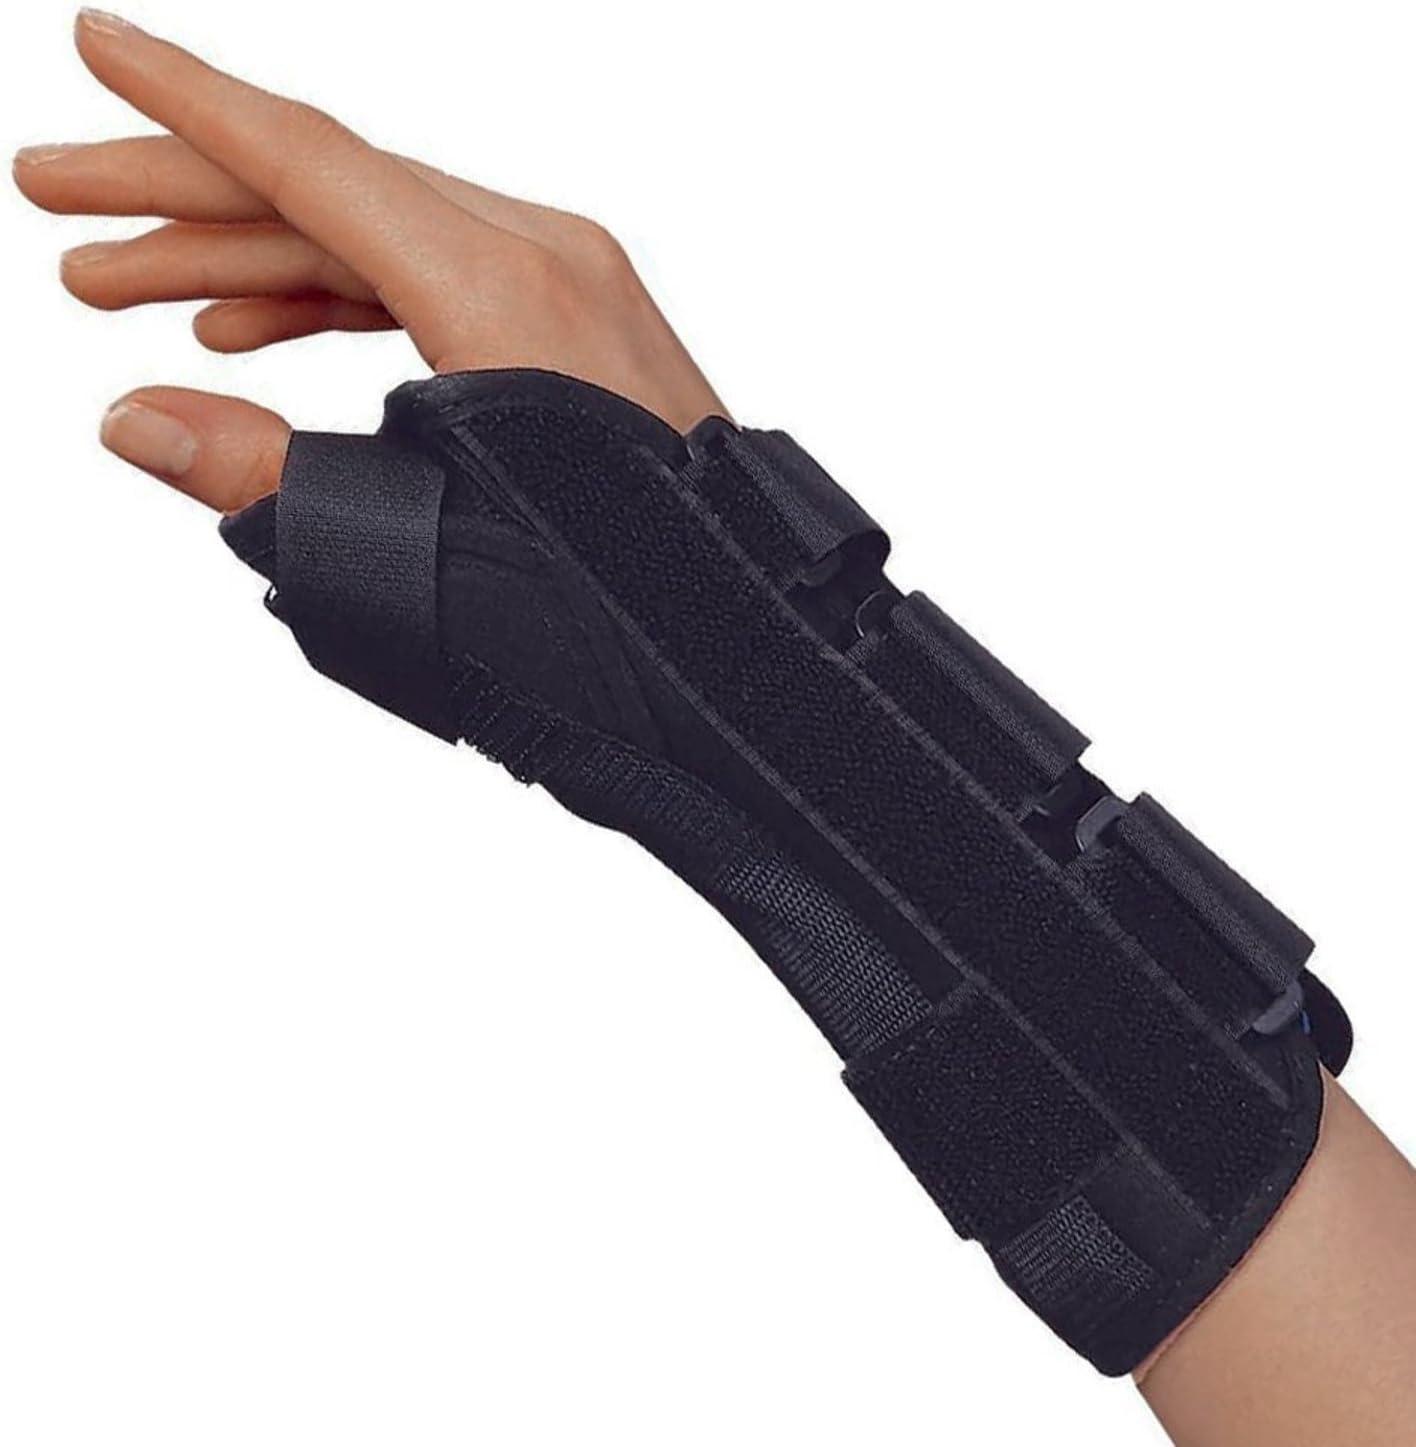 OTC Wrist-Thumb Splint 8-Inch Adult Me Lightweight Seattle Mall Direct store Breathable